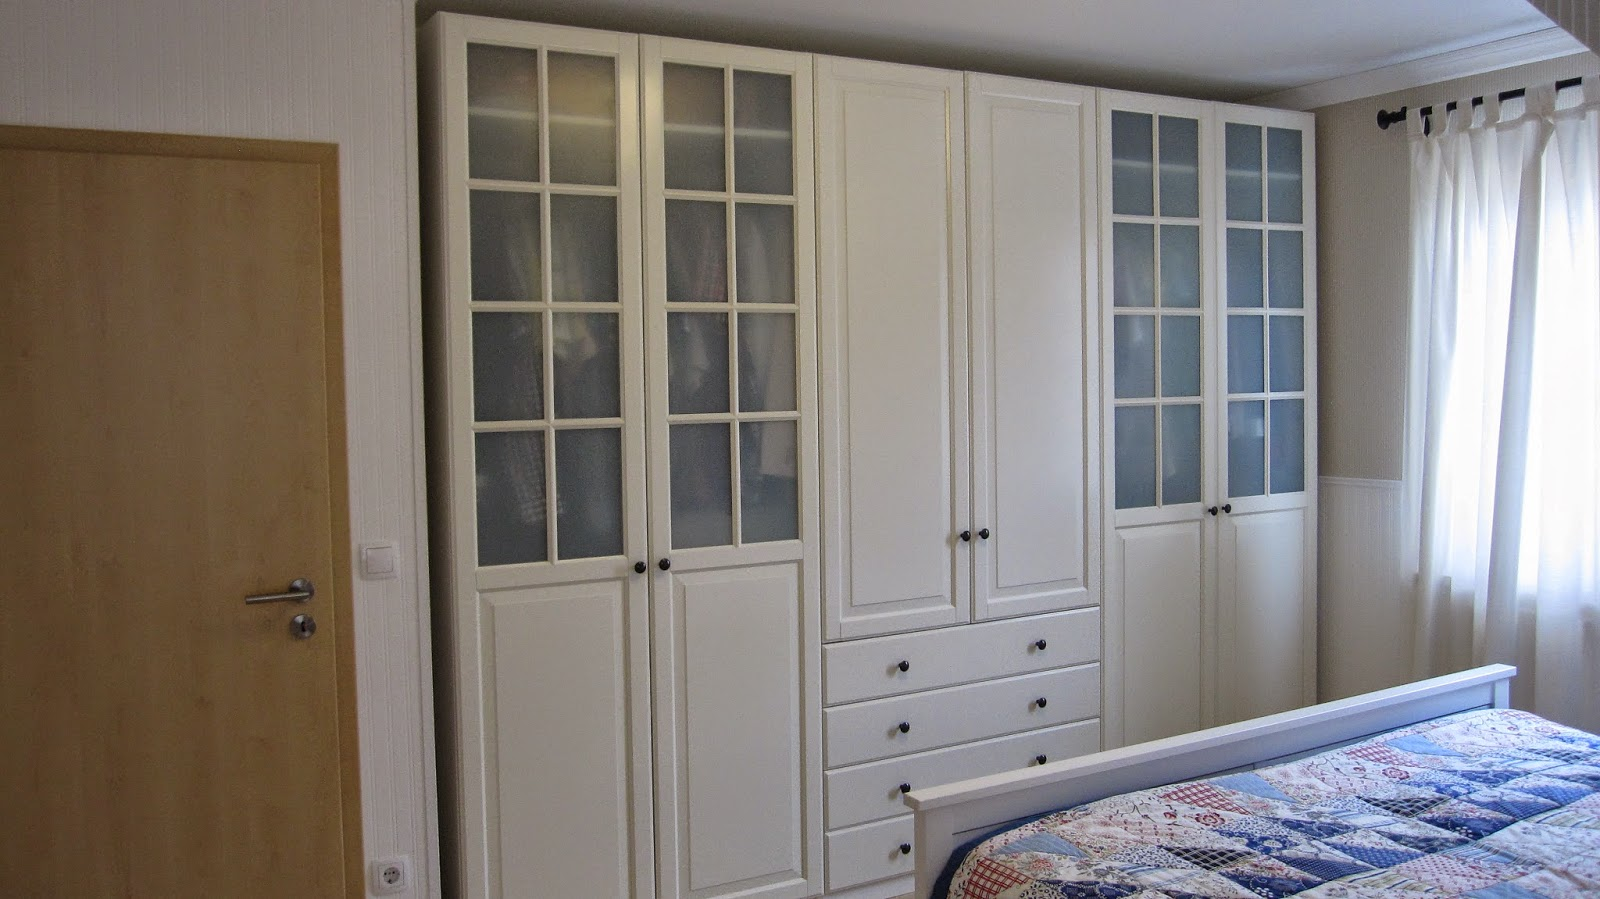 Ikea Schlafzimmer Turkis Schlafzimmer Lila Deko Fertiggardinen Set